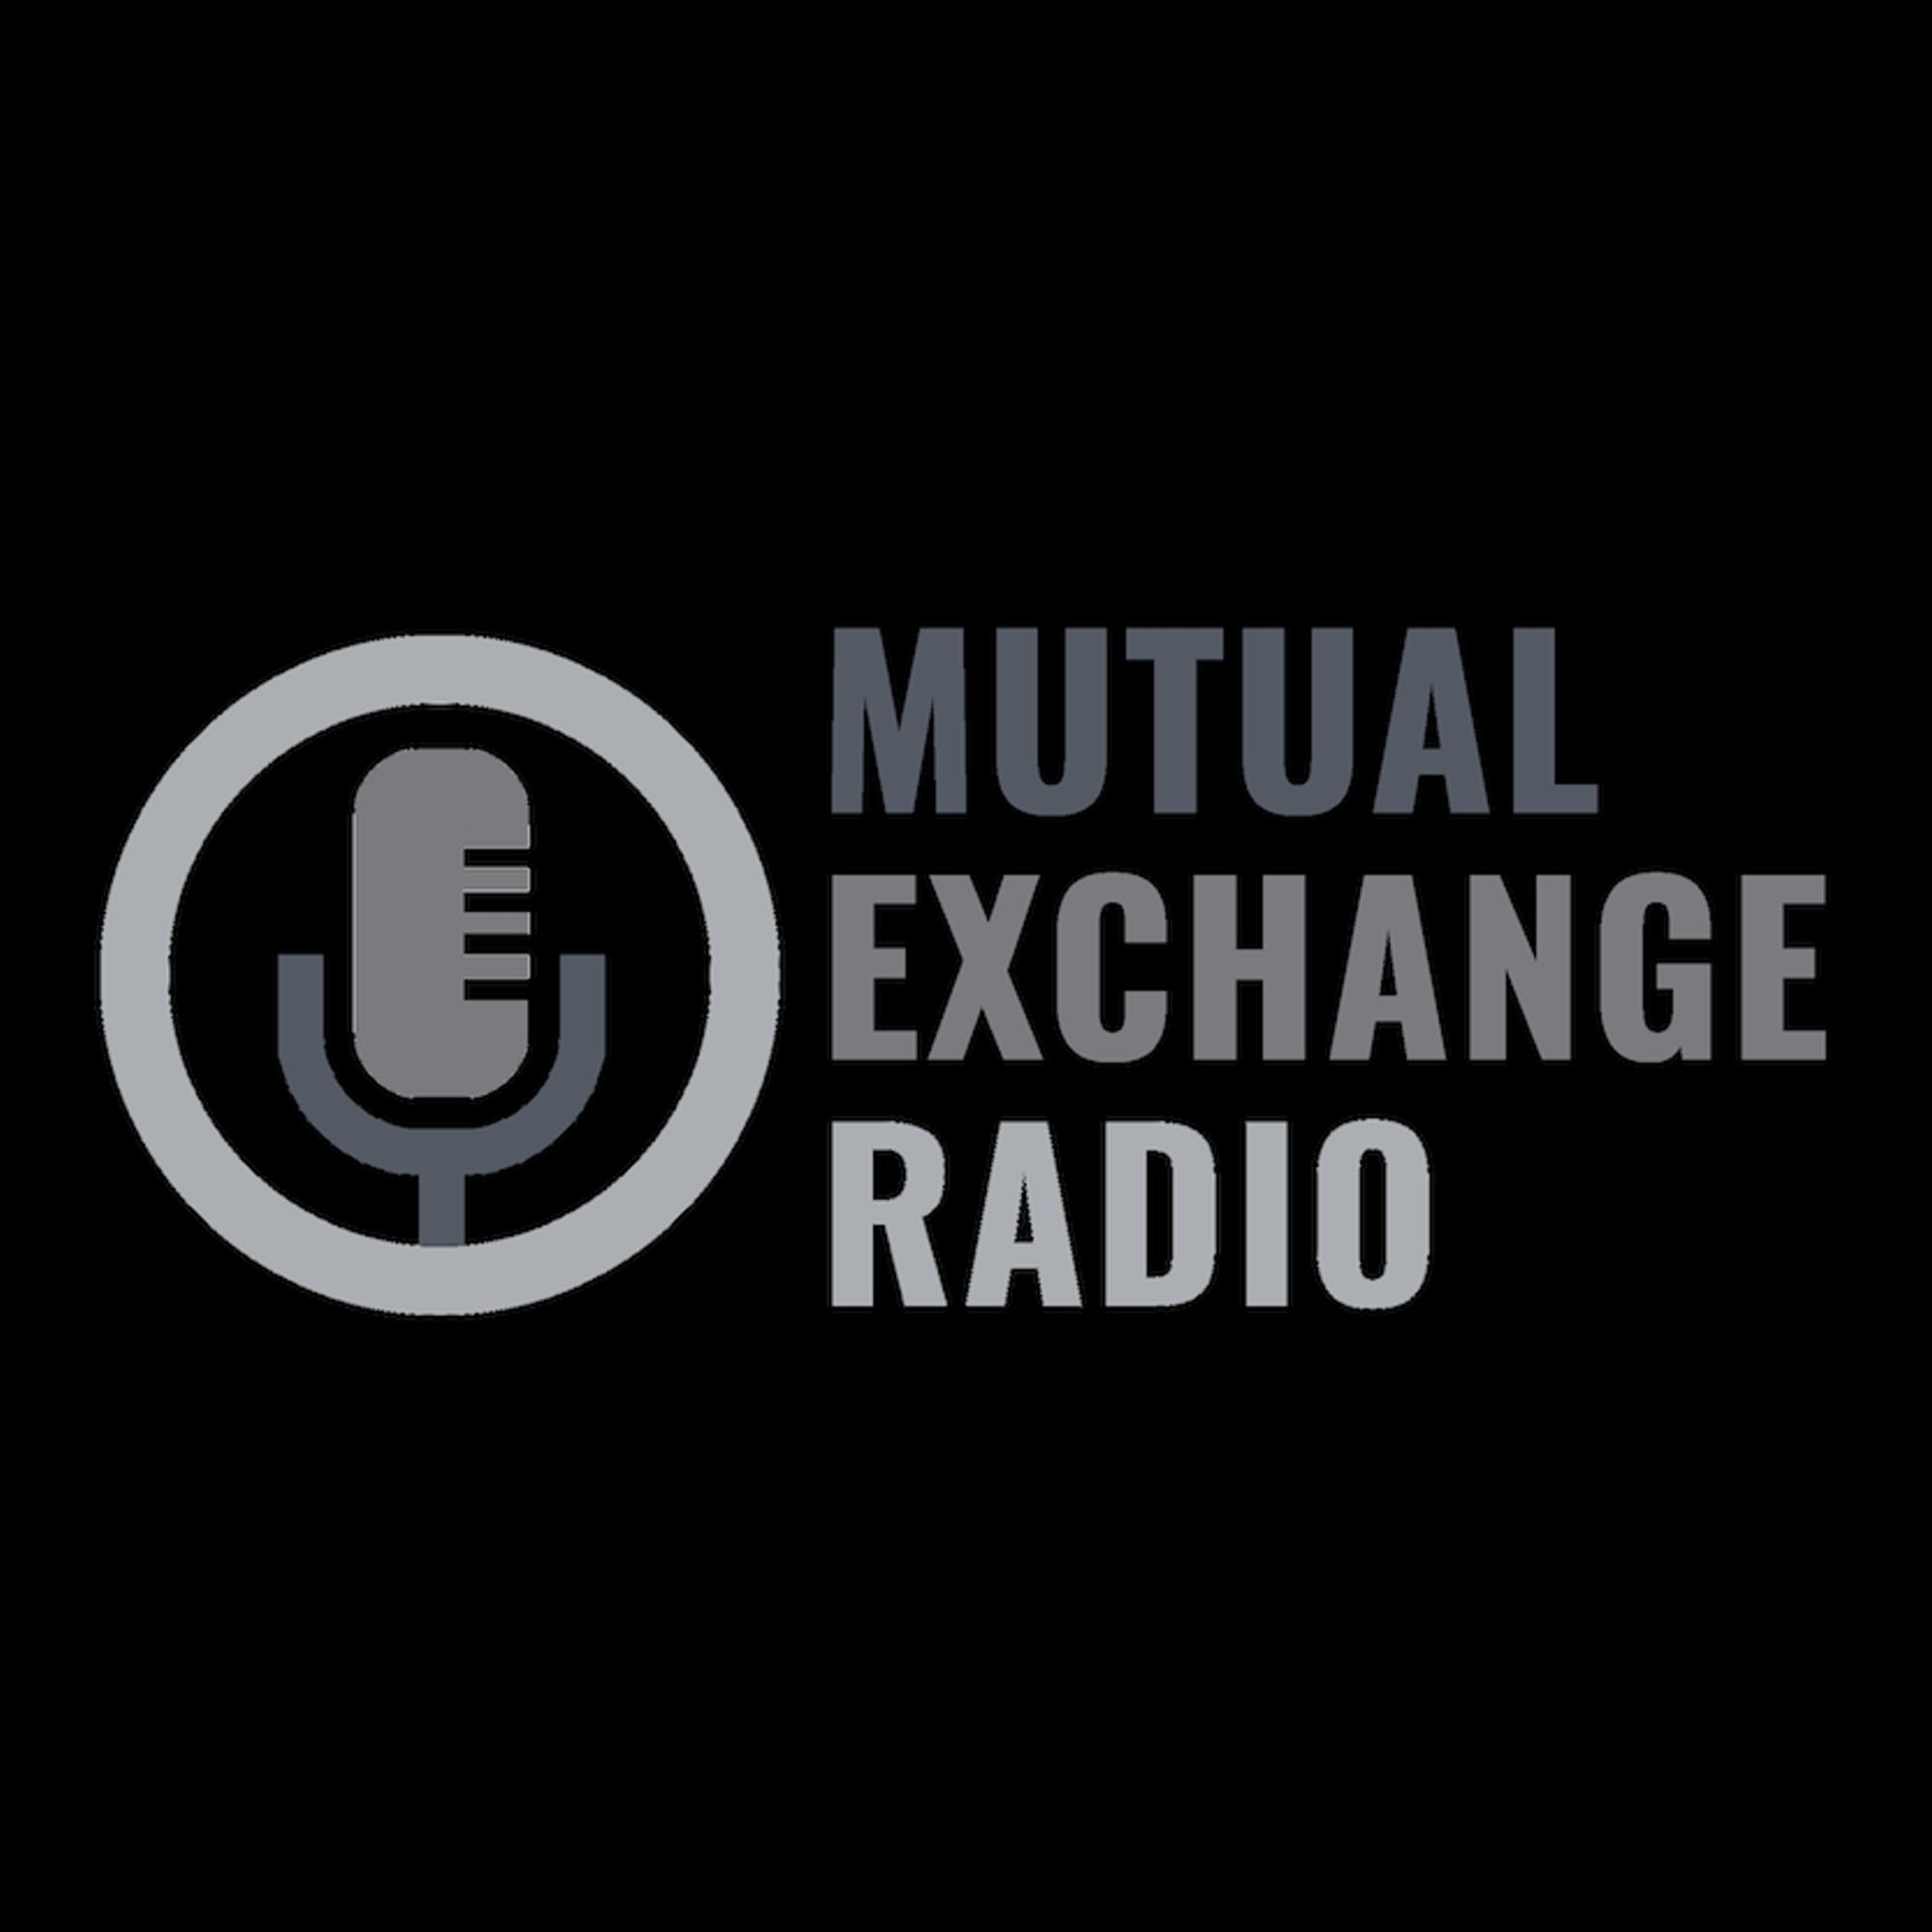 Mutual Exchange Radio show art